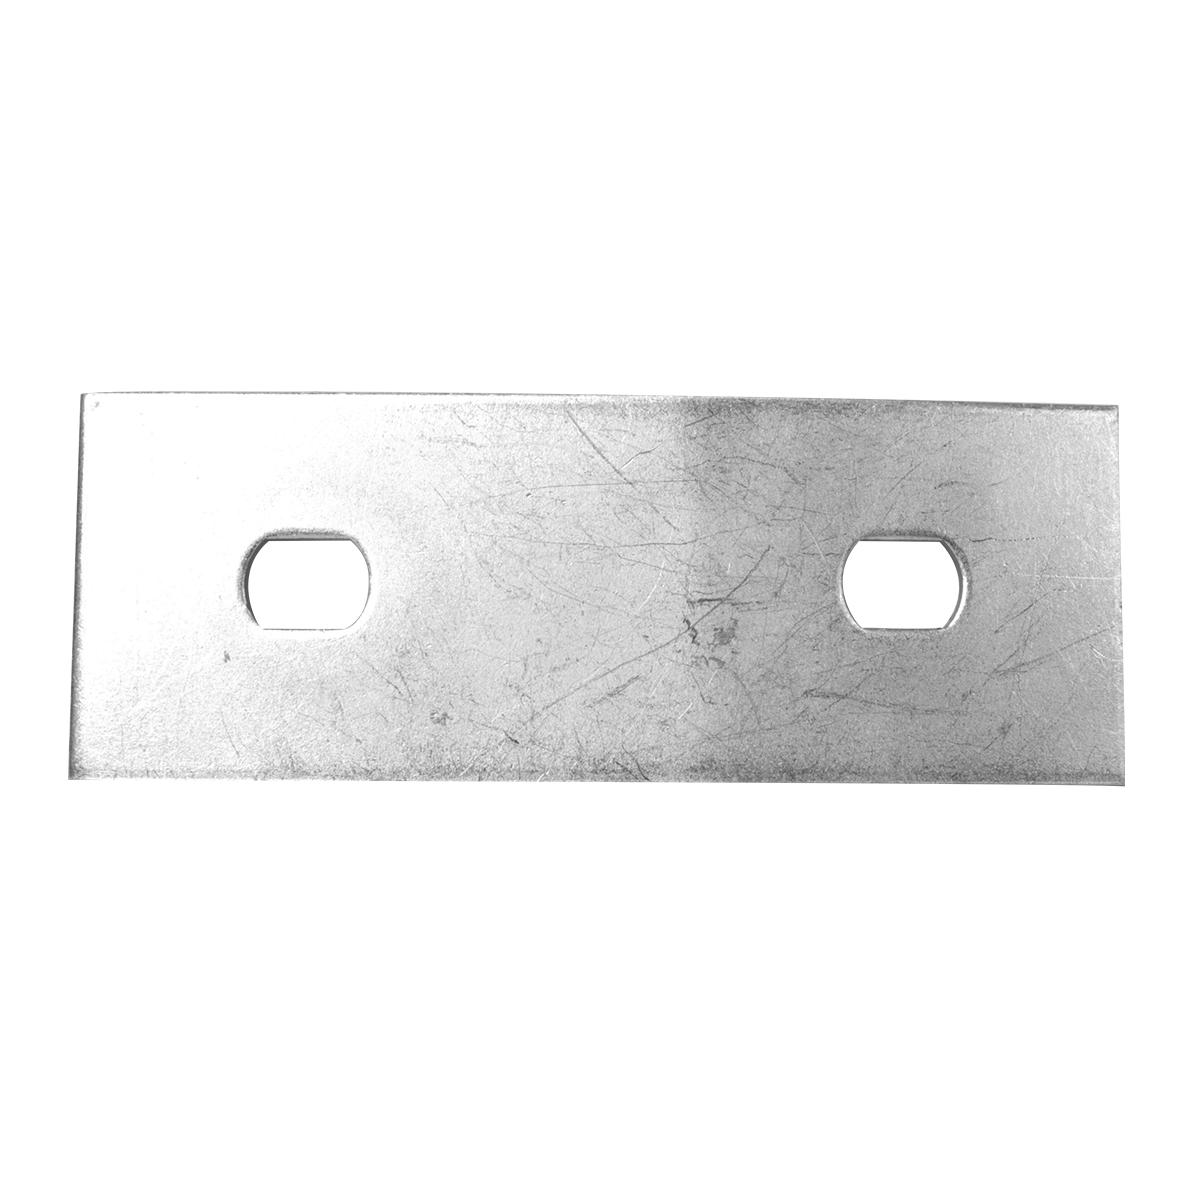 #94147 Stainless Steel Bumper Guide Bracket Kit For Plastic Bumper - Back View